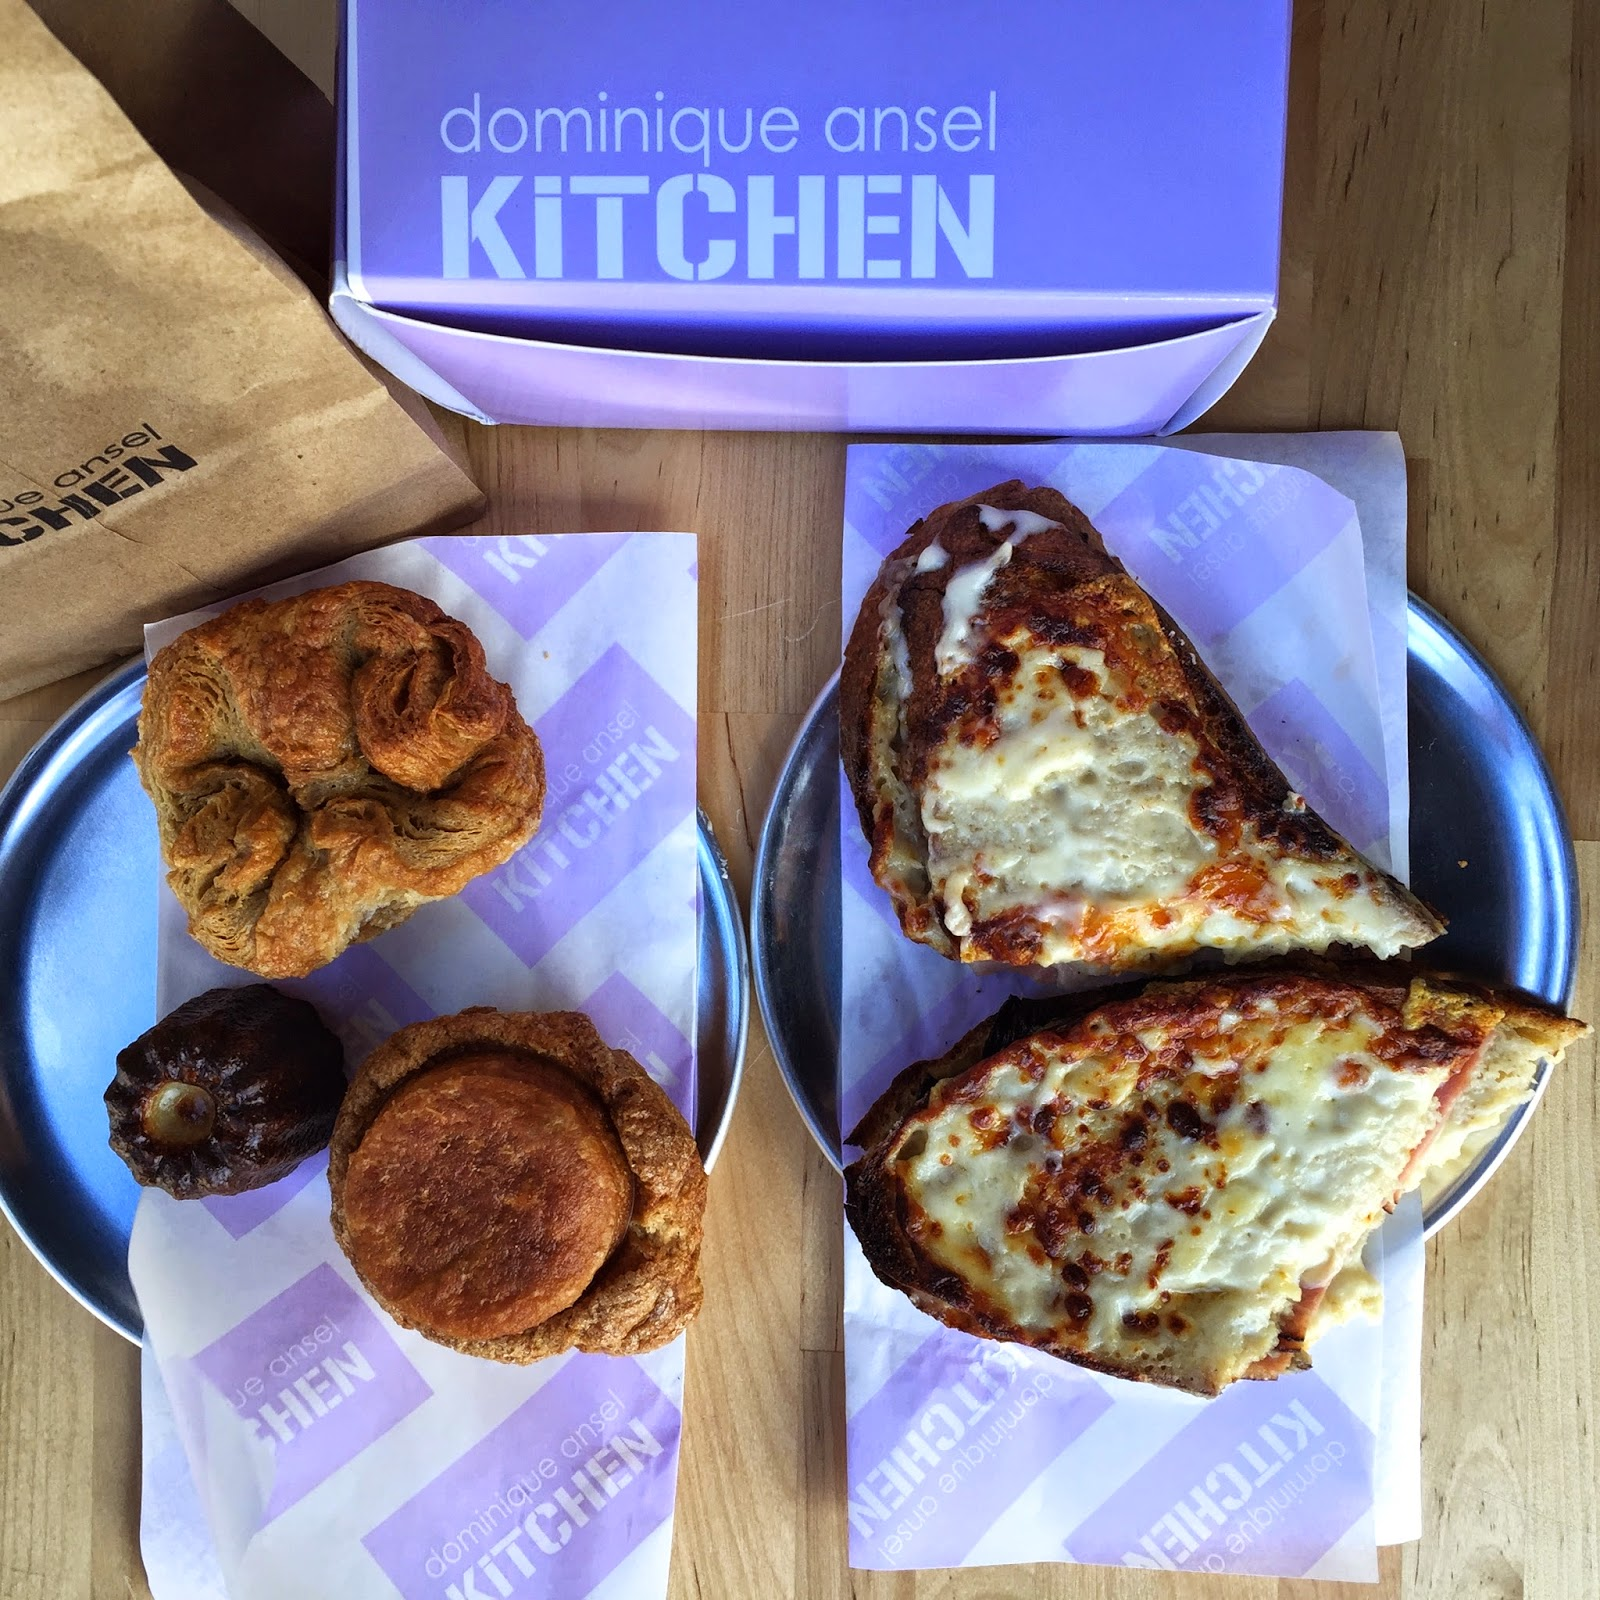 eat here now dominique ansel kitchen - Dominique Ansel Kitchen